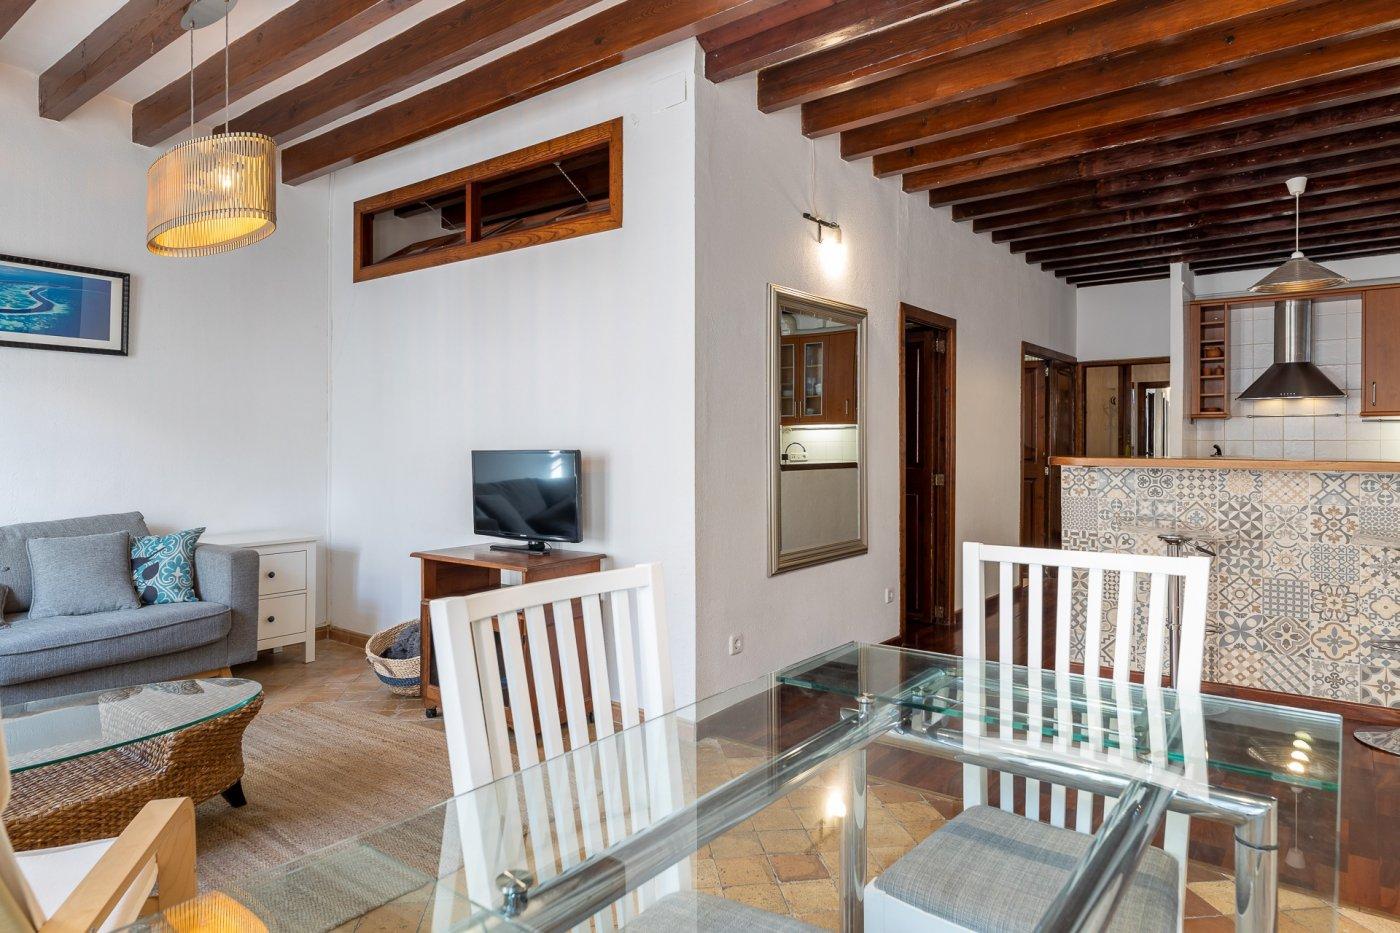 Espectacular apartamento en centro de palma - imagenInmueble28